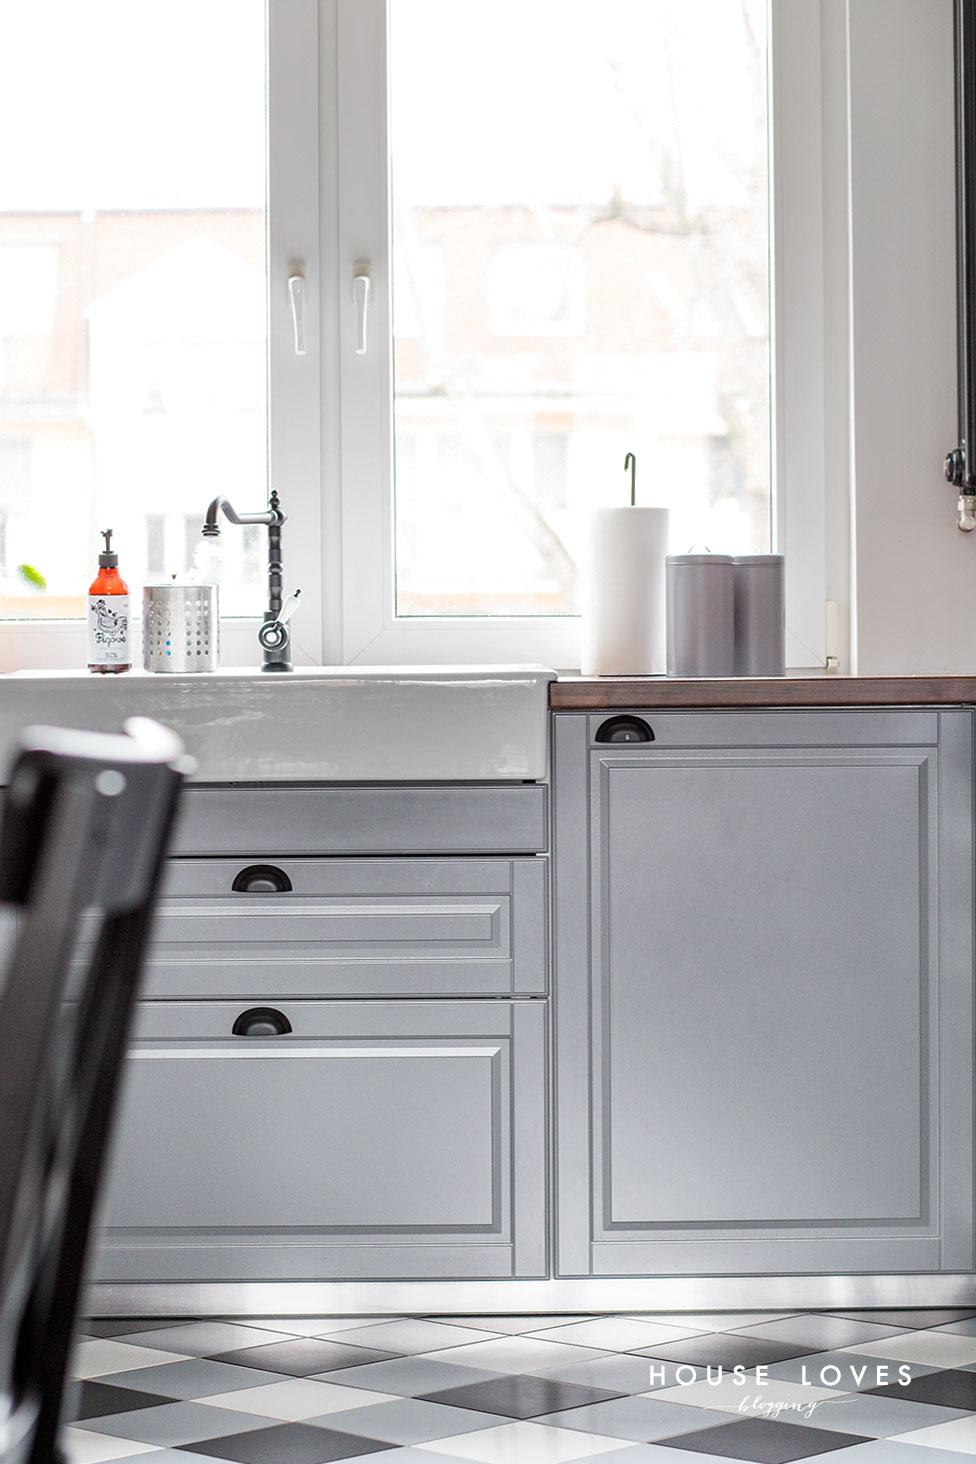 Projekt Kuchni Z Szarymi Frontami Ikea Bodbyn House Loves